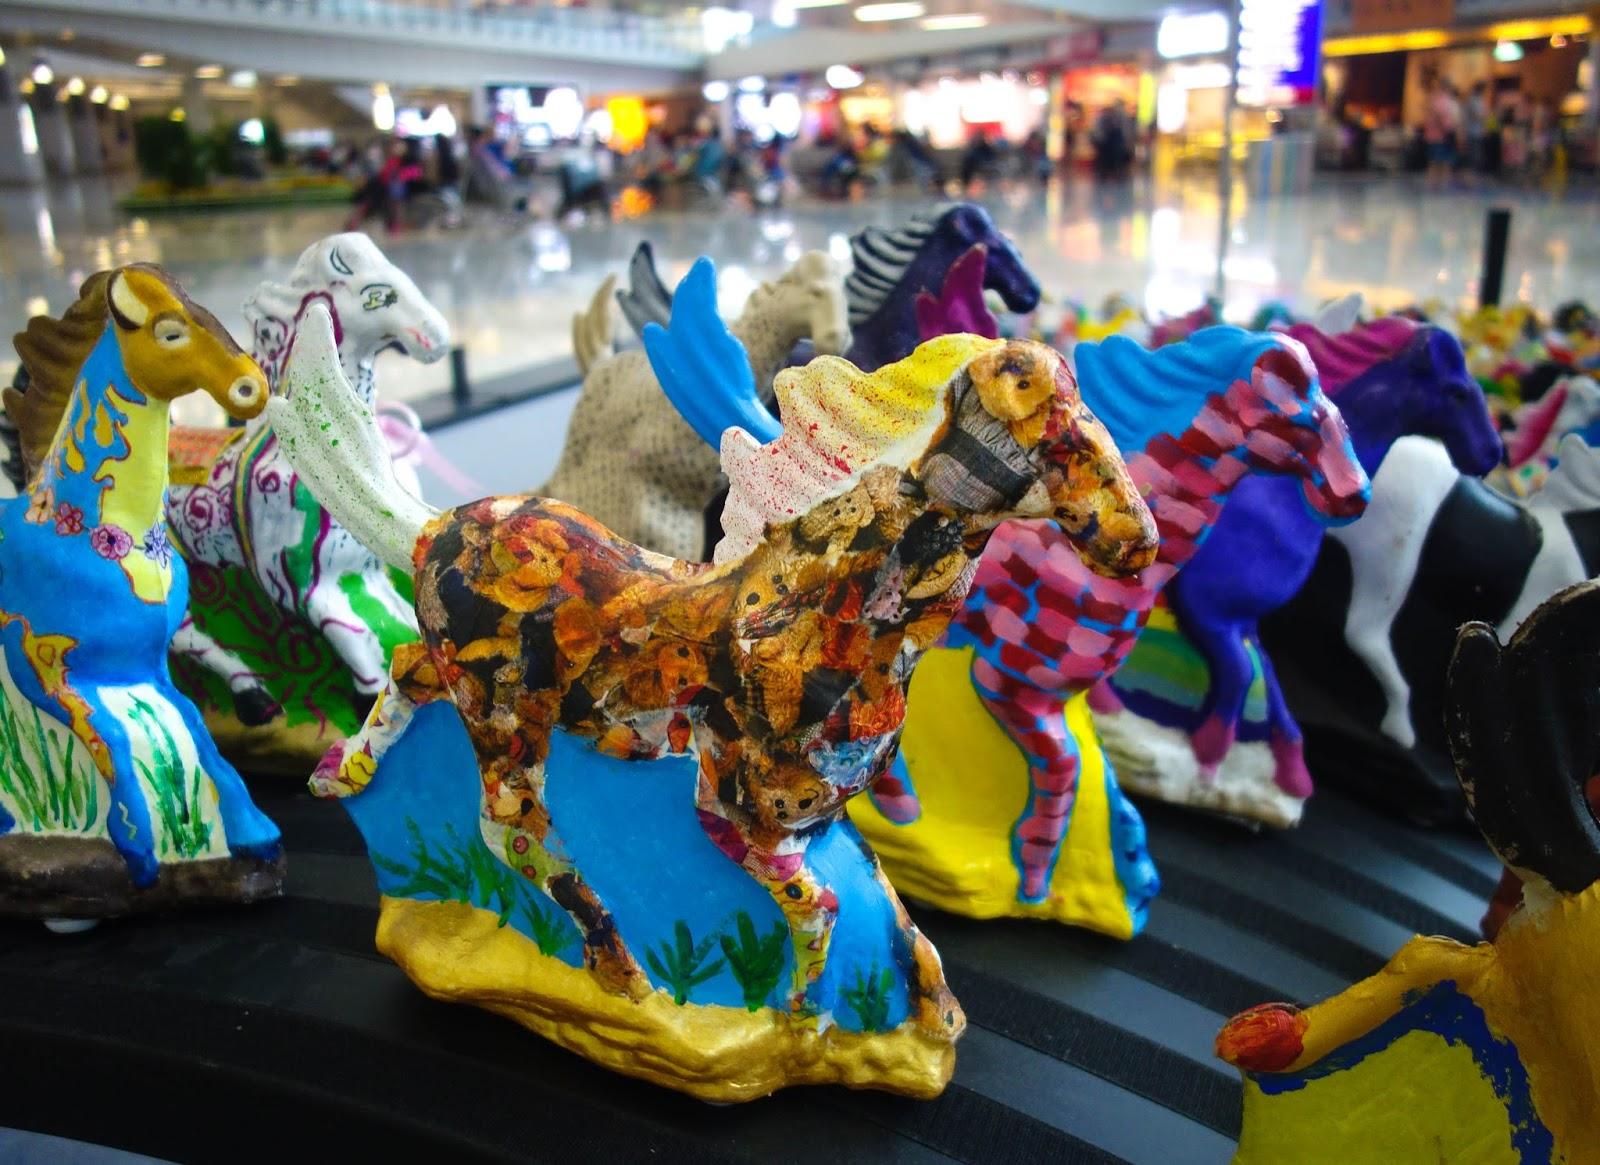 6 Galloping Horses by Xu